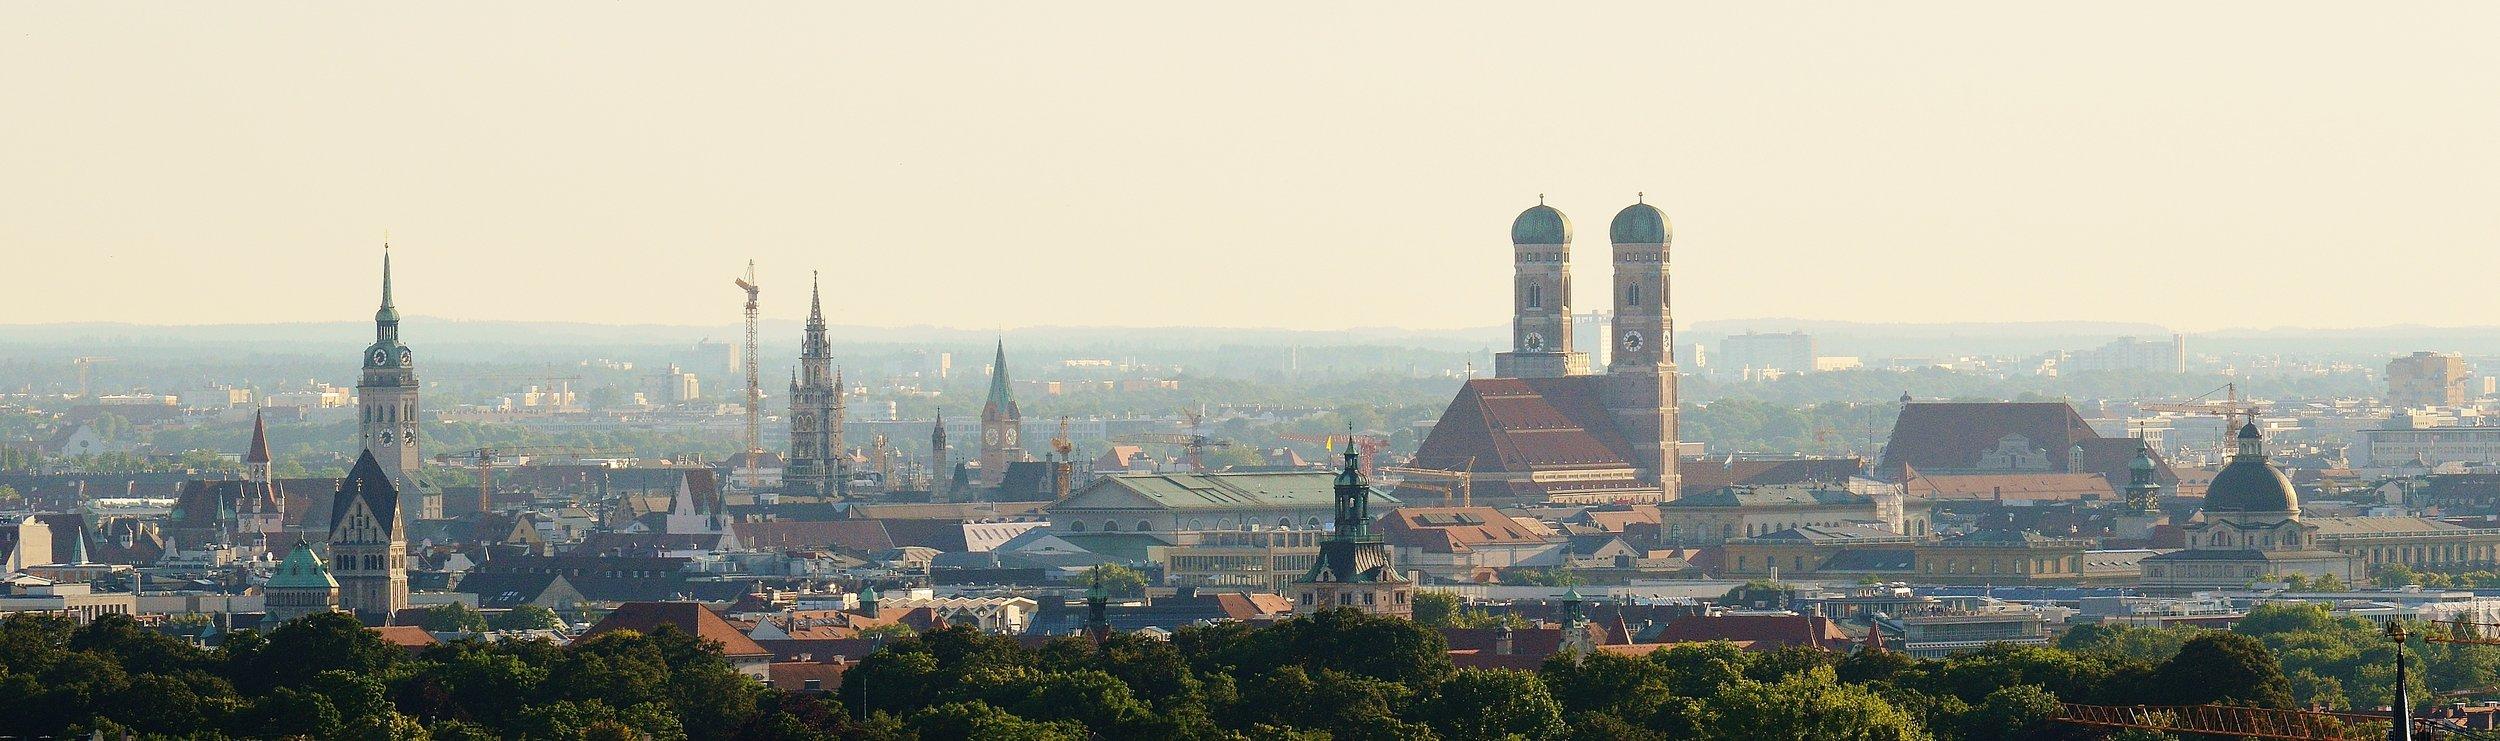 München, Panoramabild